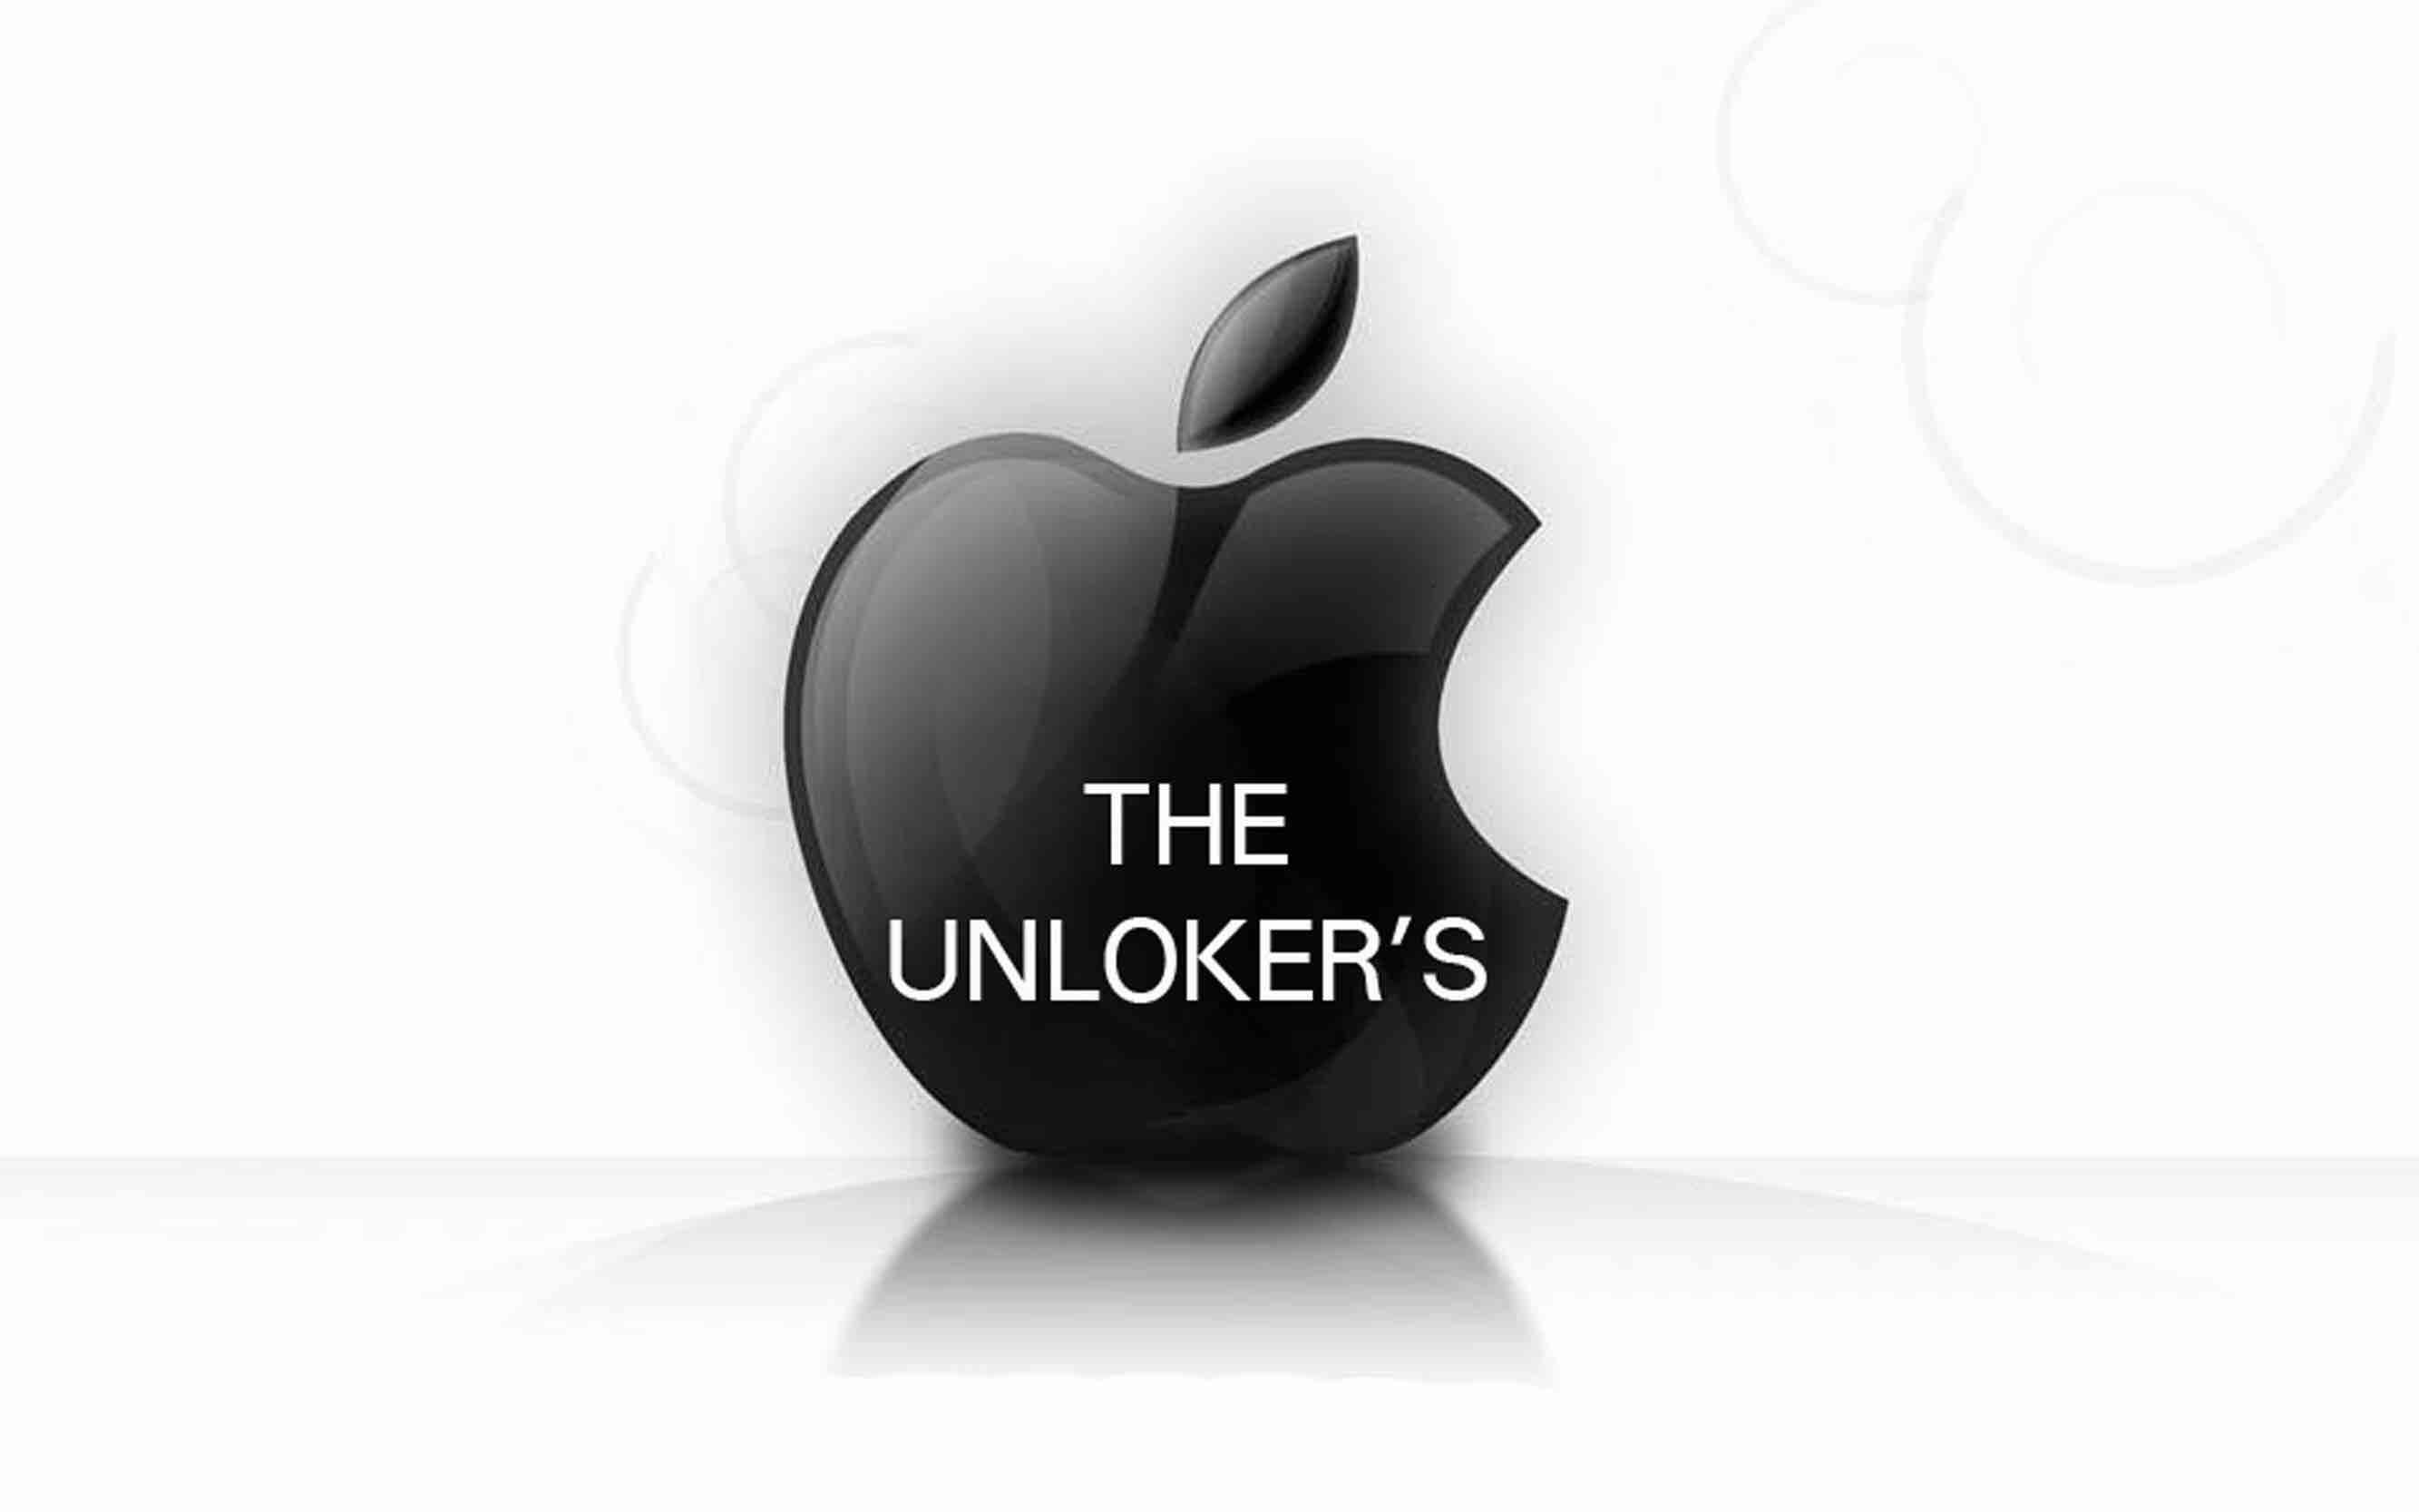 The Unlockers